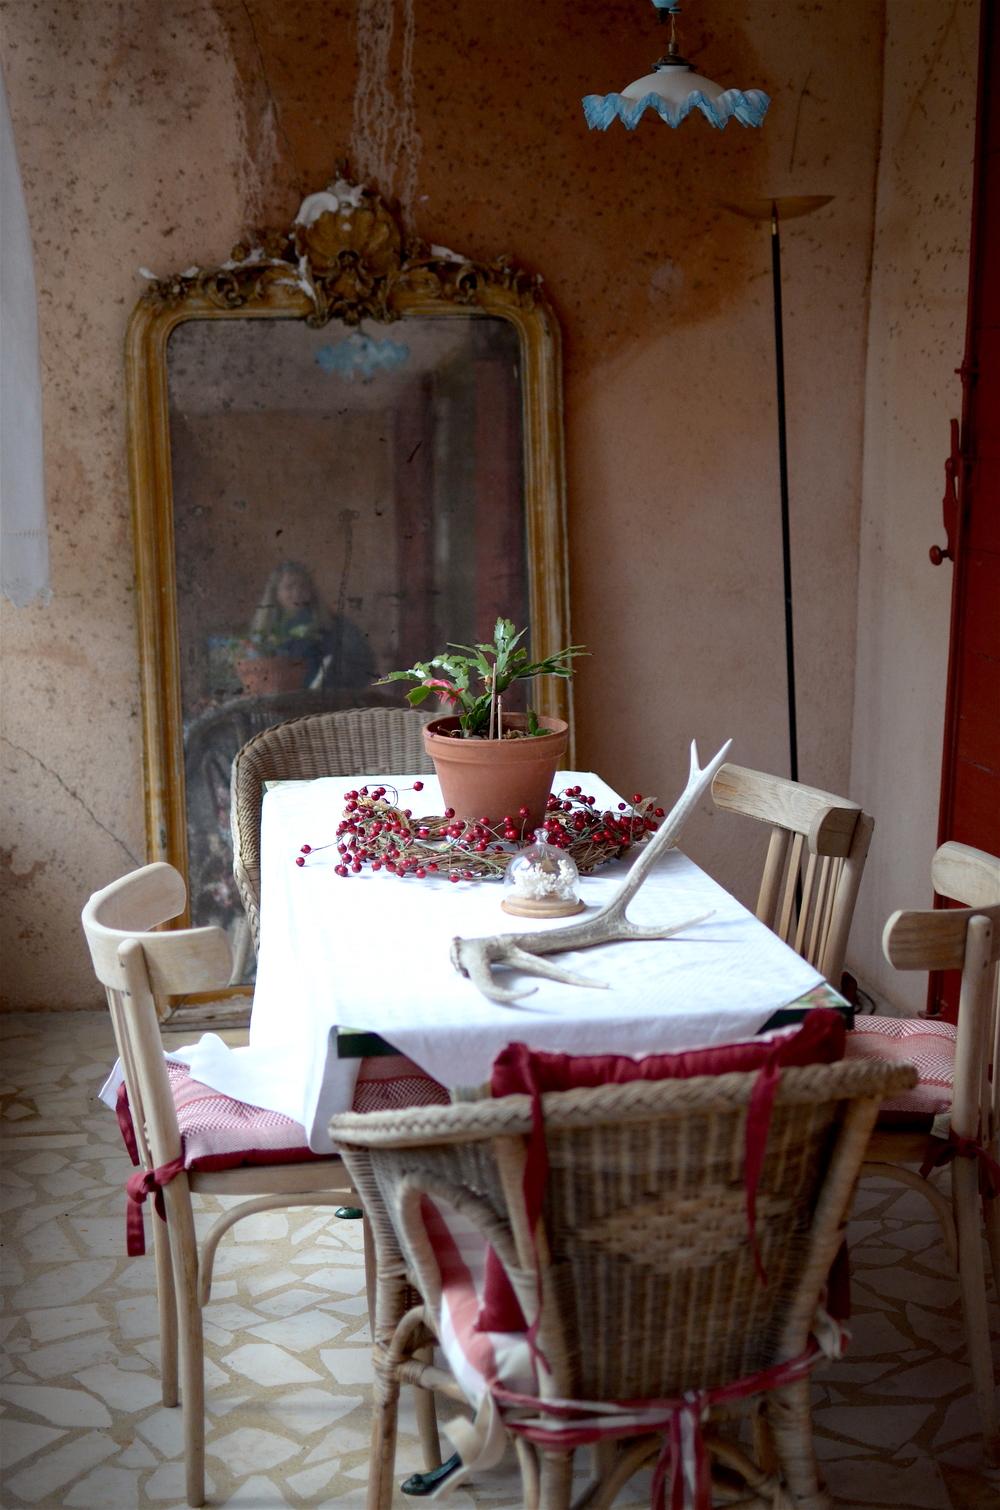 twinky lizzy blog aix en provence - enw 09.jpg